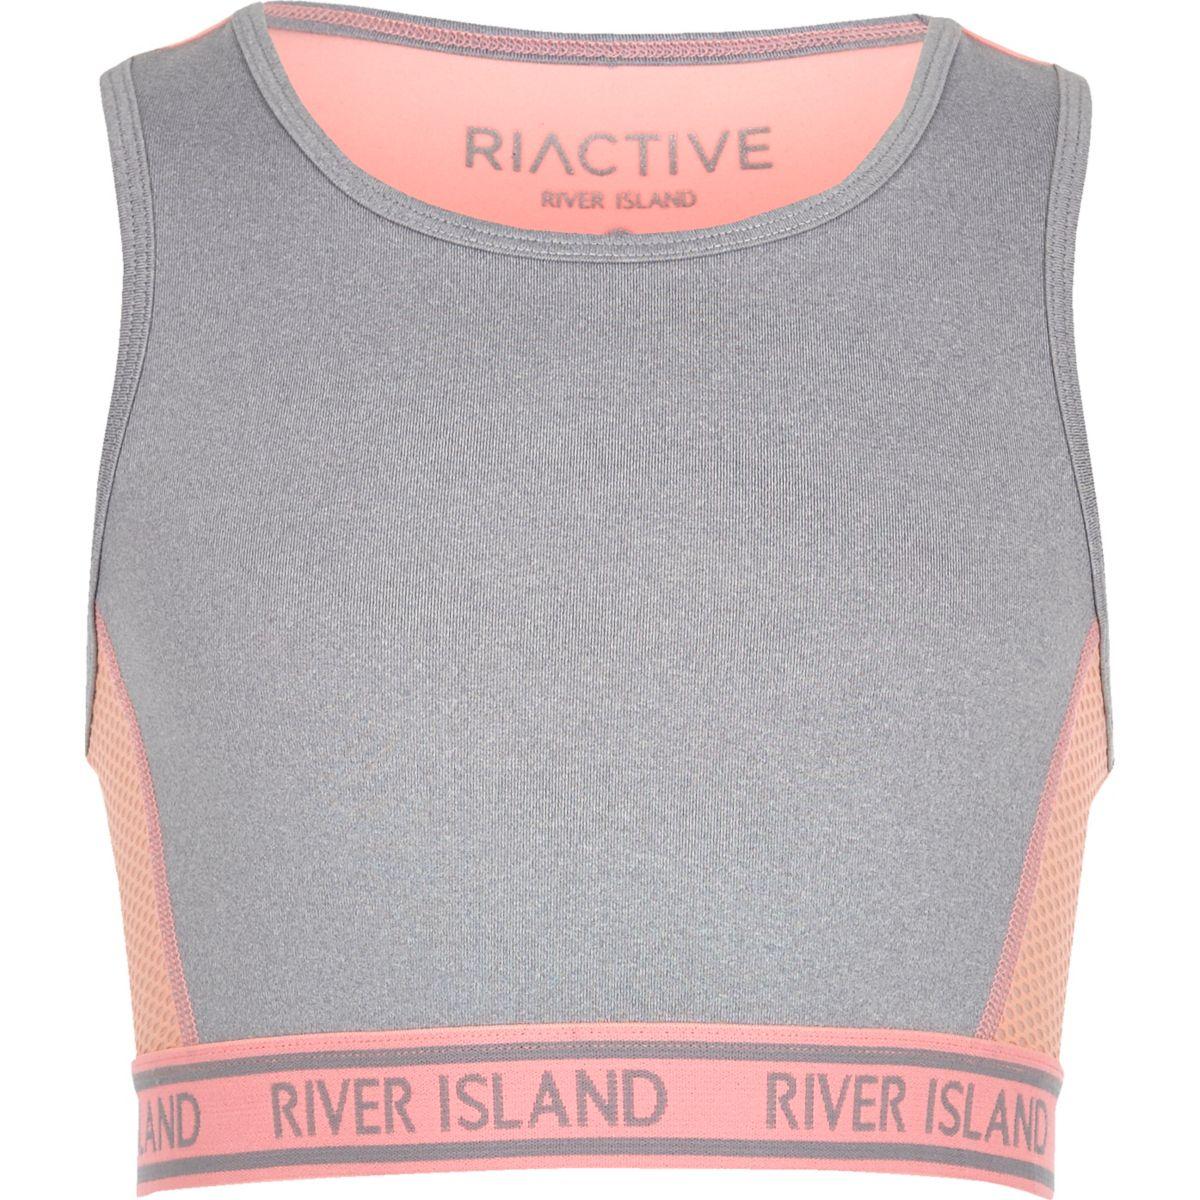 Girls RI Active grey sports crop top